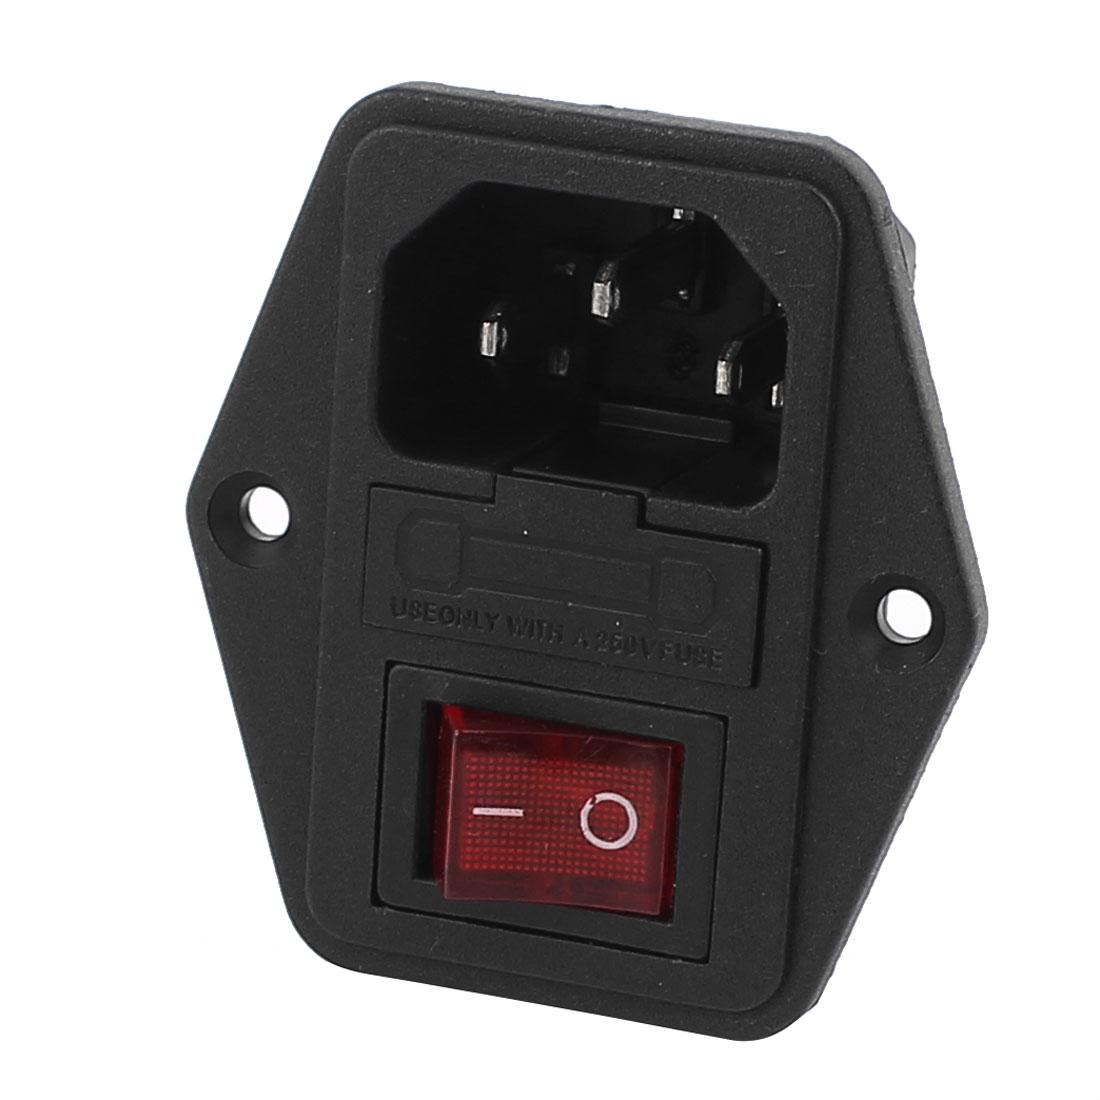 AC 250V 10A 4P Red LED Rocker Switch Fuse Holder Inlet Power Socket Screw Mount